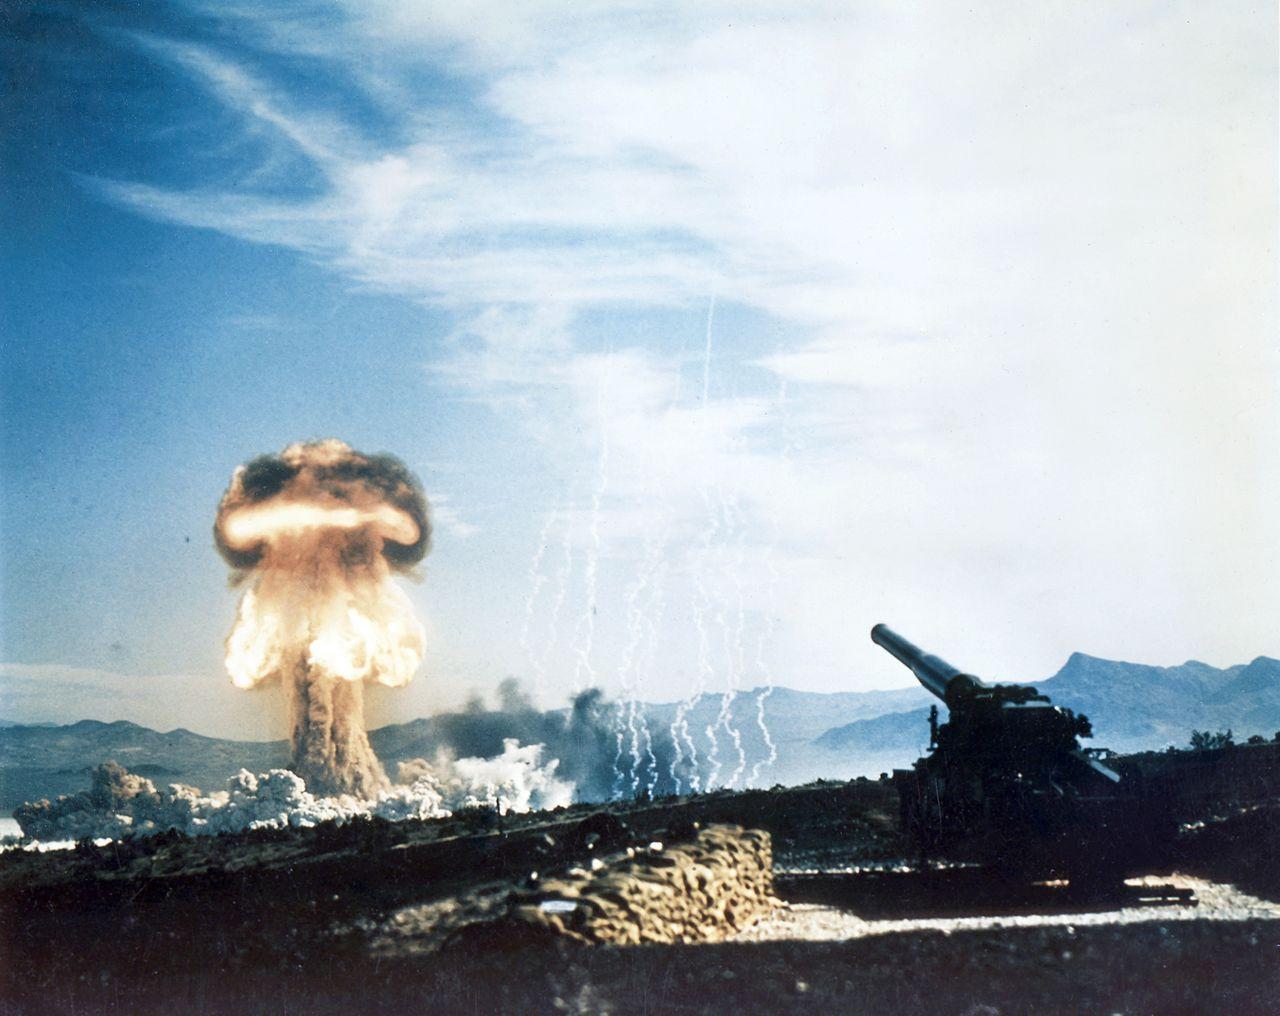 1280px-Nuclear_artillery_test_Grable_Eve